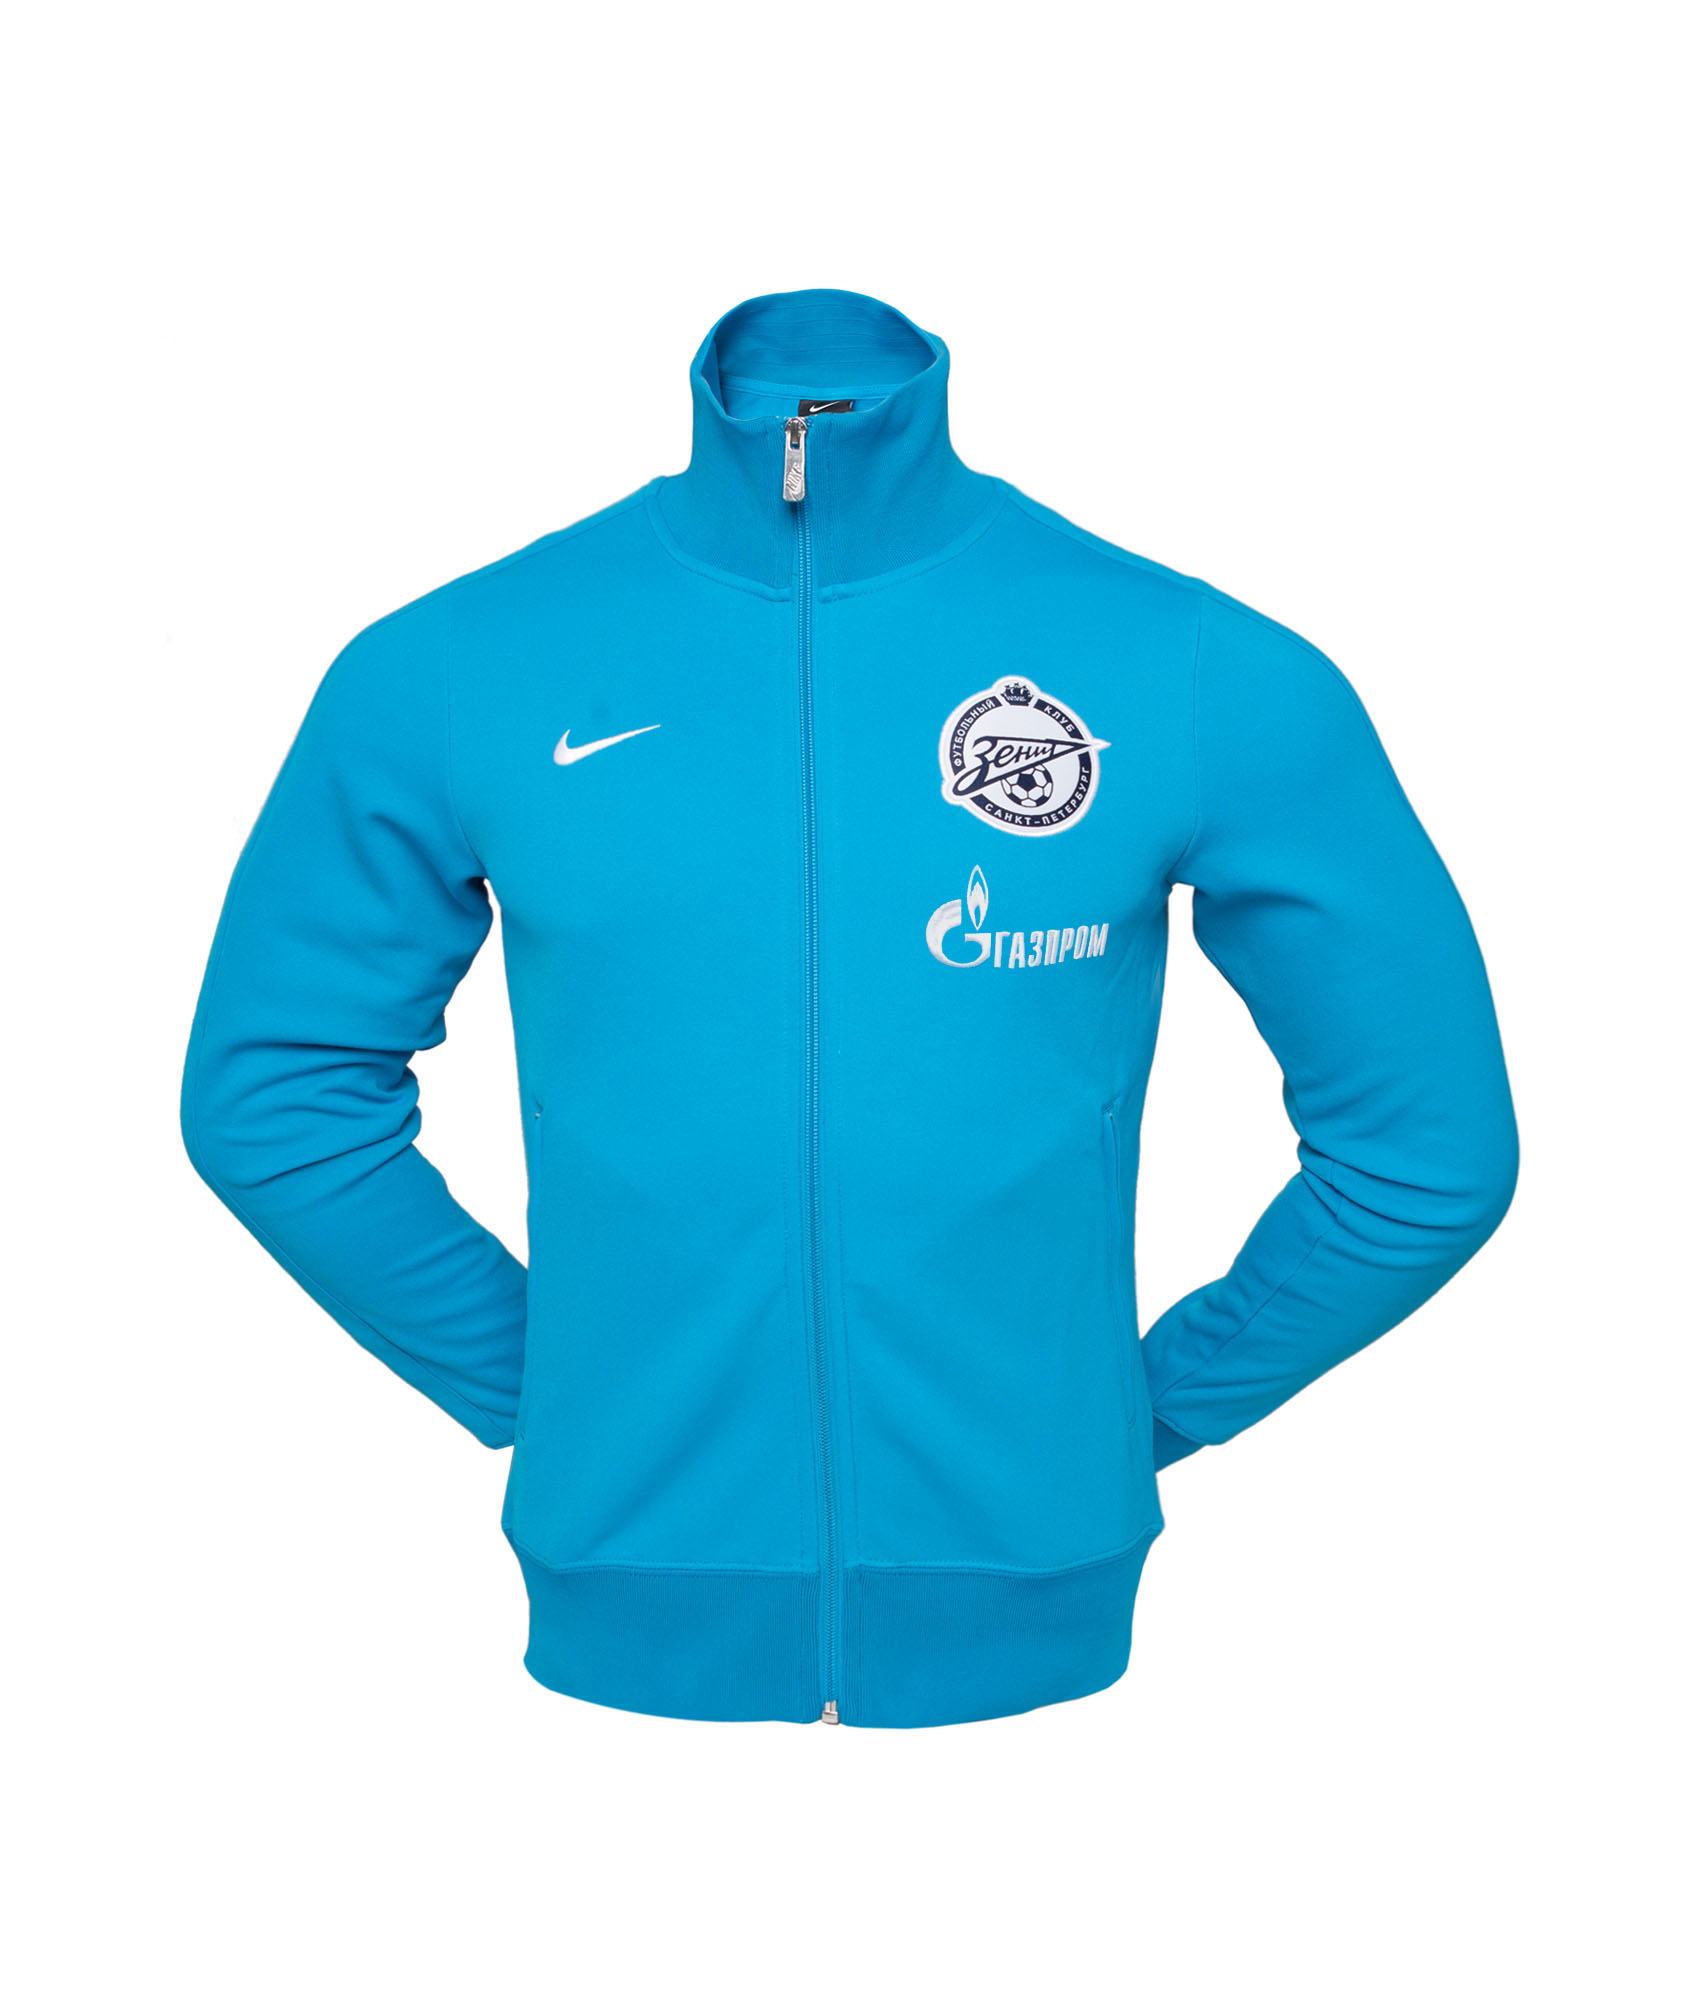 Лазурная олимпийка Nike, Цвет-Бело-Голубой, Размер-XL